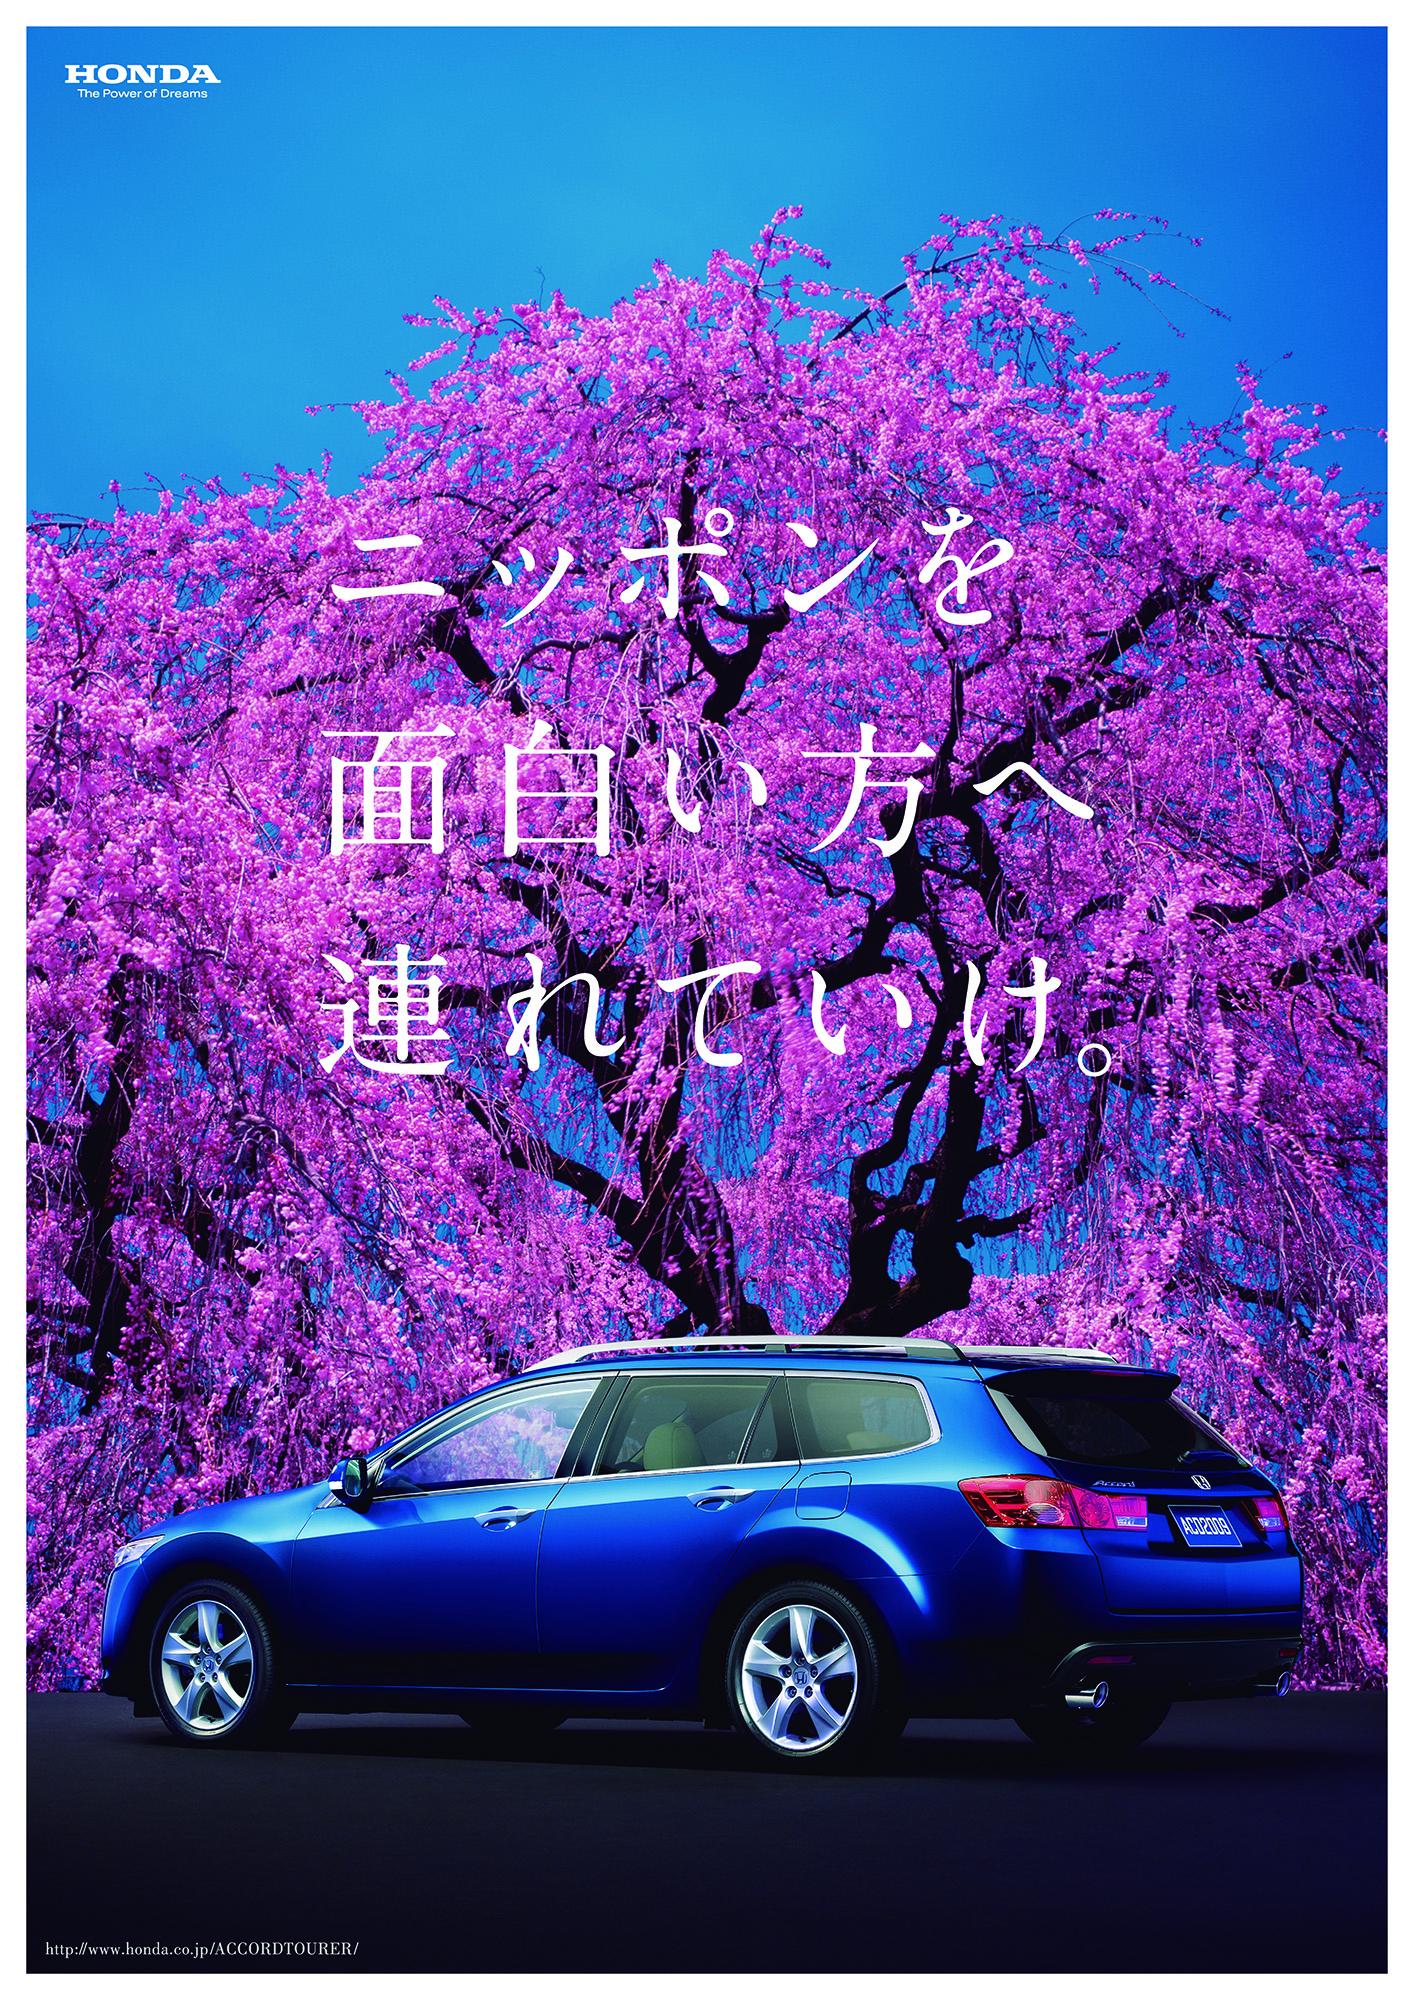 honda_accord_cherry_2000px_72dpi_縦.jpg